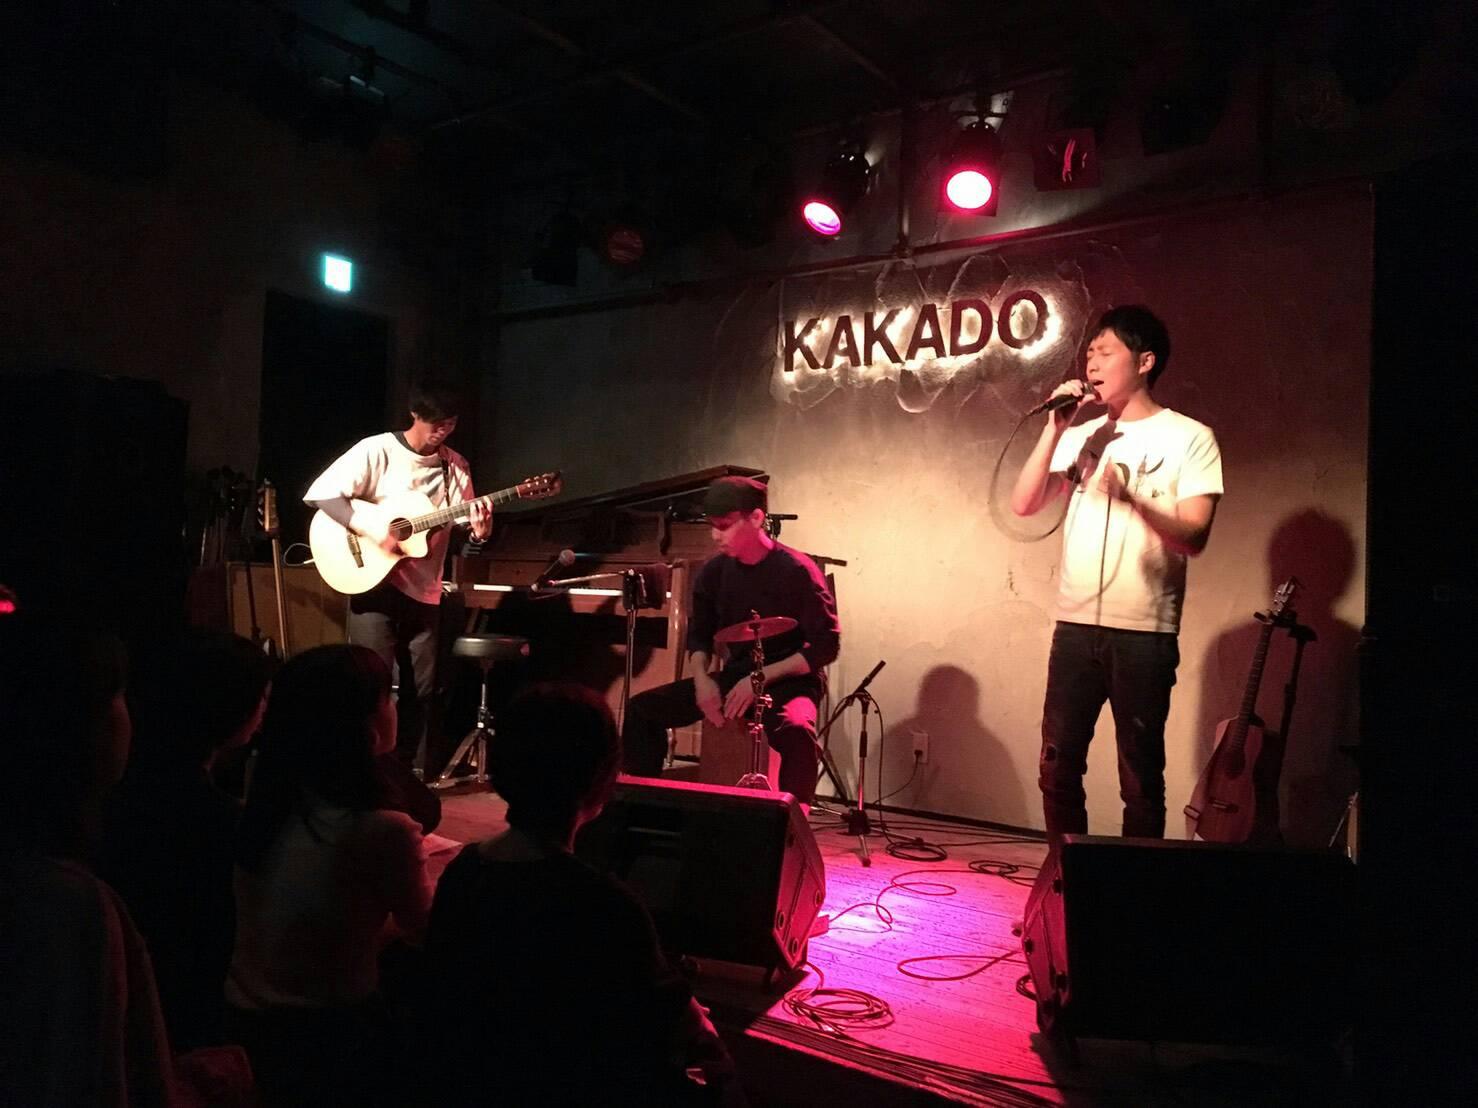 2017.10.29 LIVE レビュー 100曲カバー挑戦